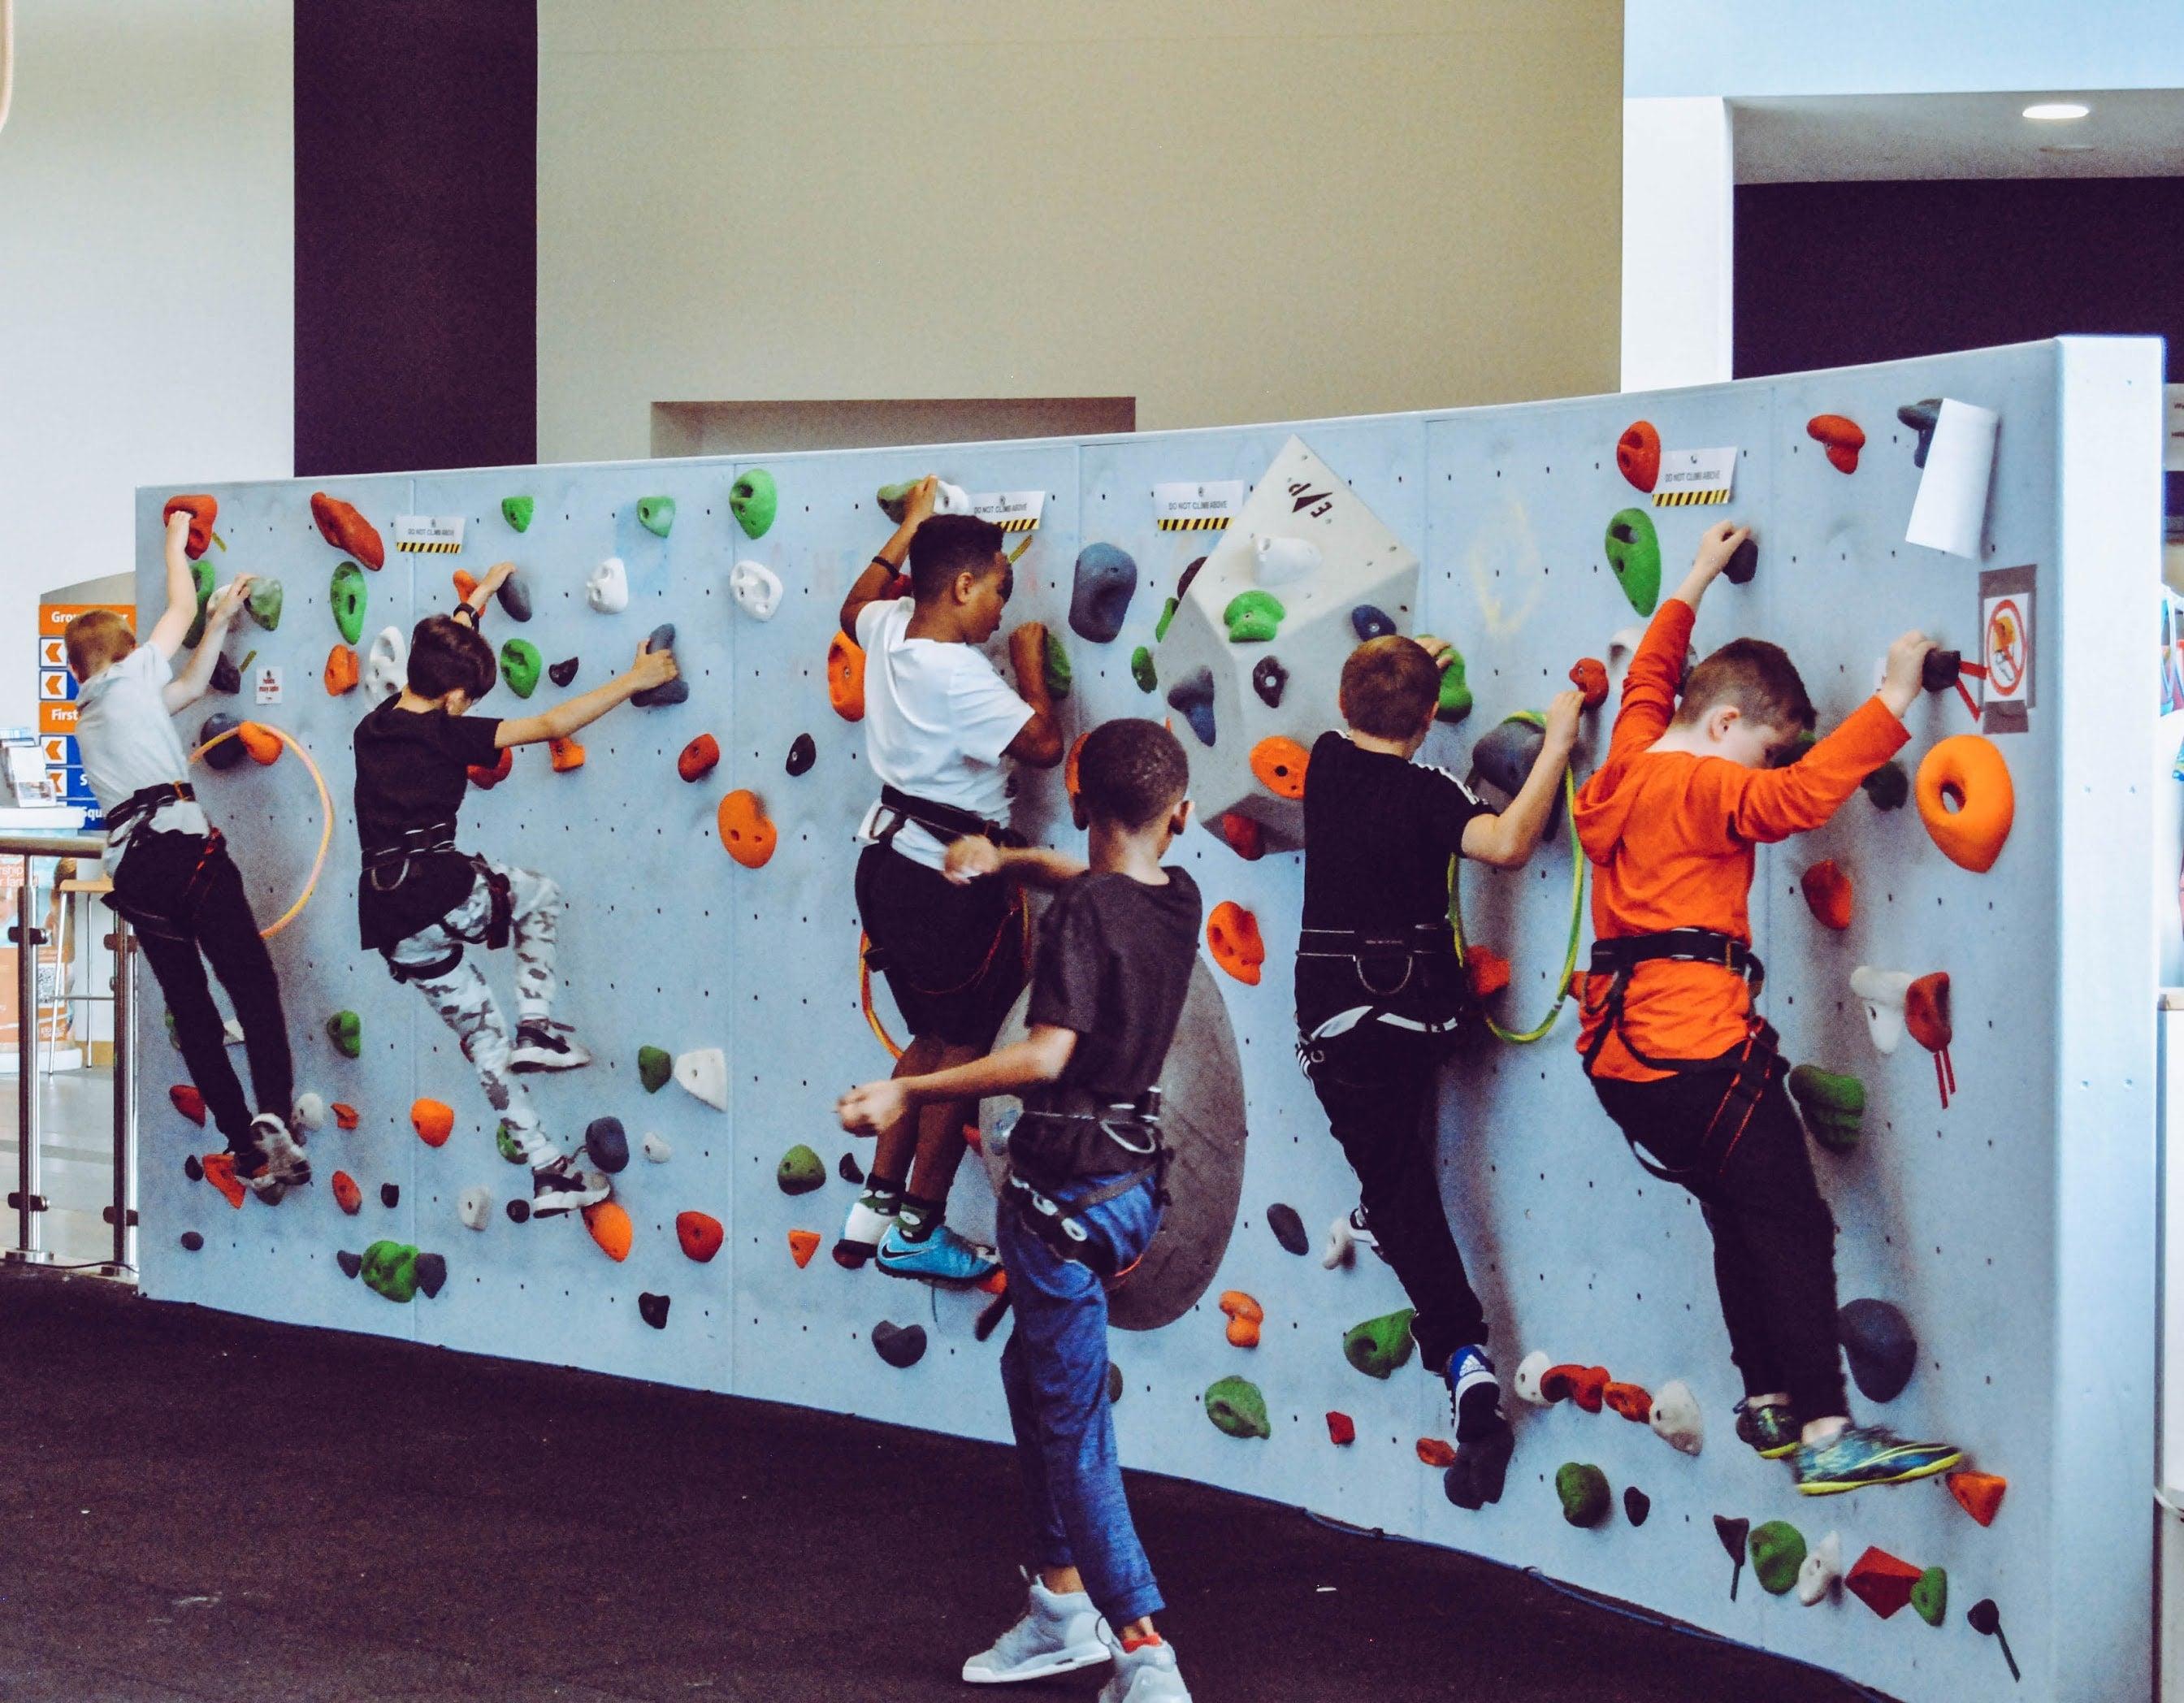 Children bouldering